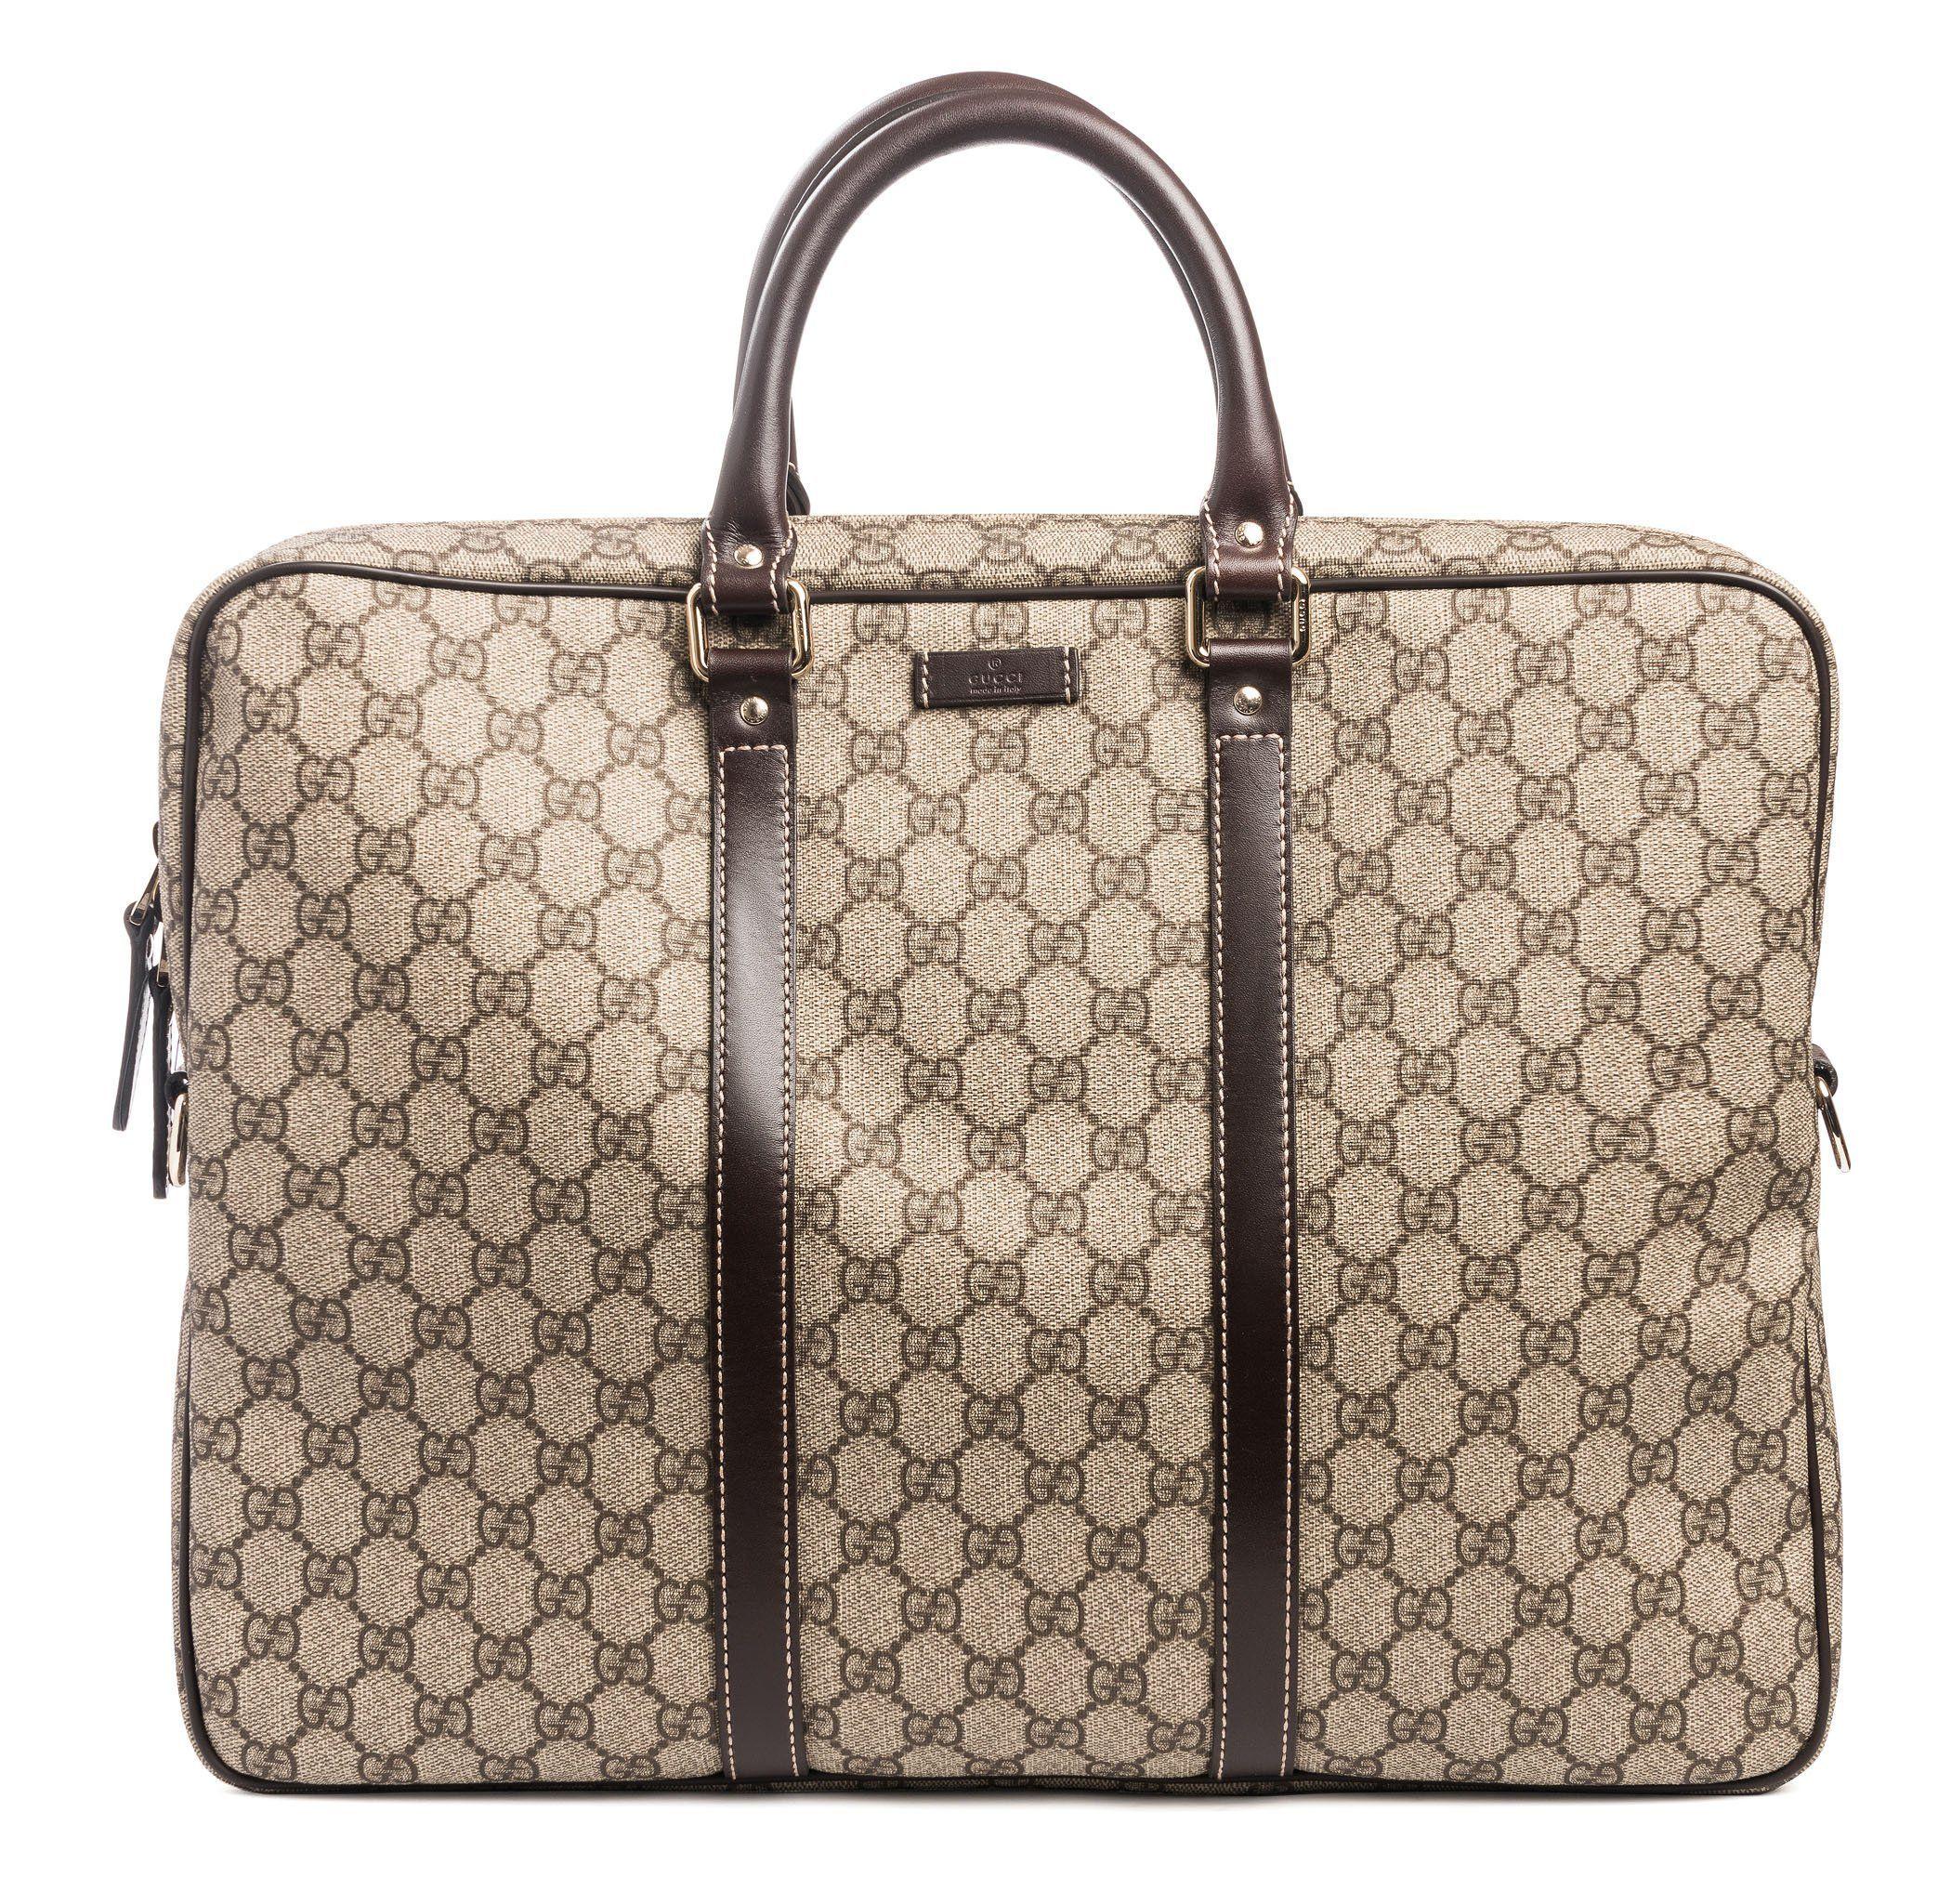 76d93b91d1b Gucci Men s Briefcase Beige Ebony GG Coated Canvas 201480 FCIEG 9643 ...